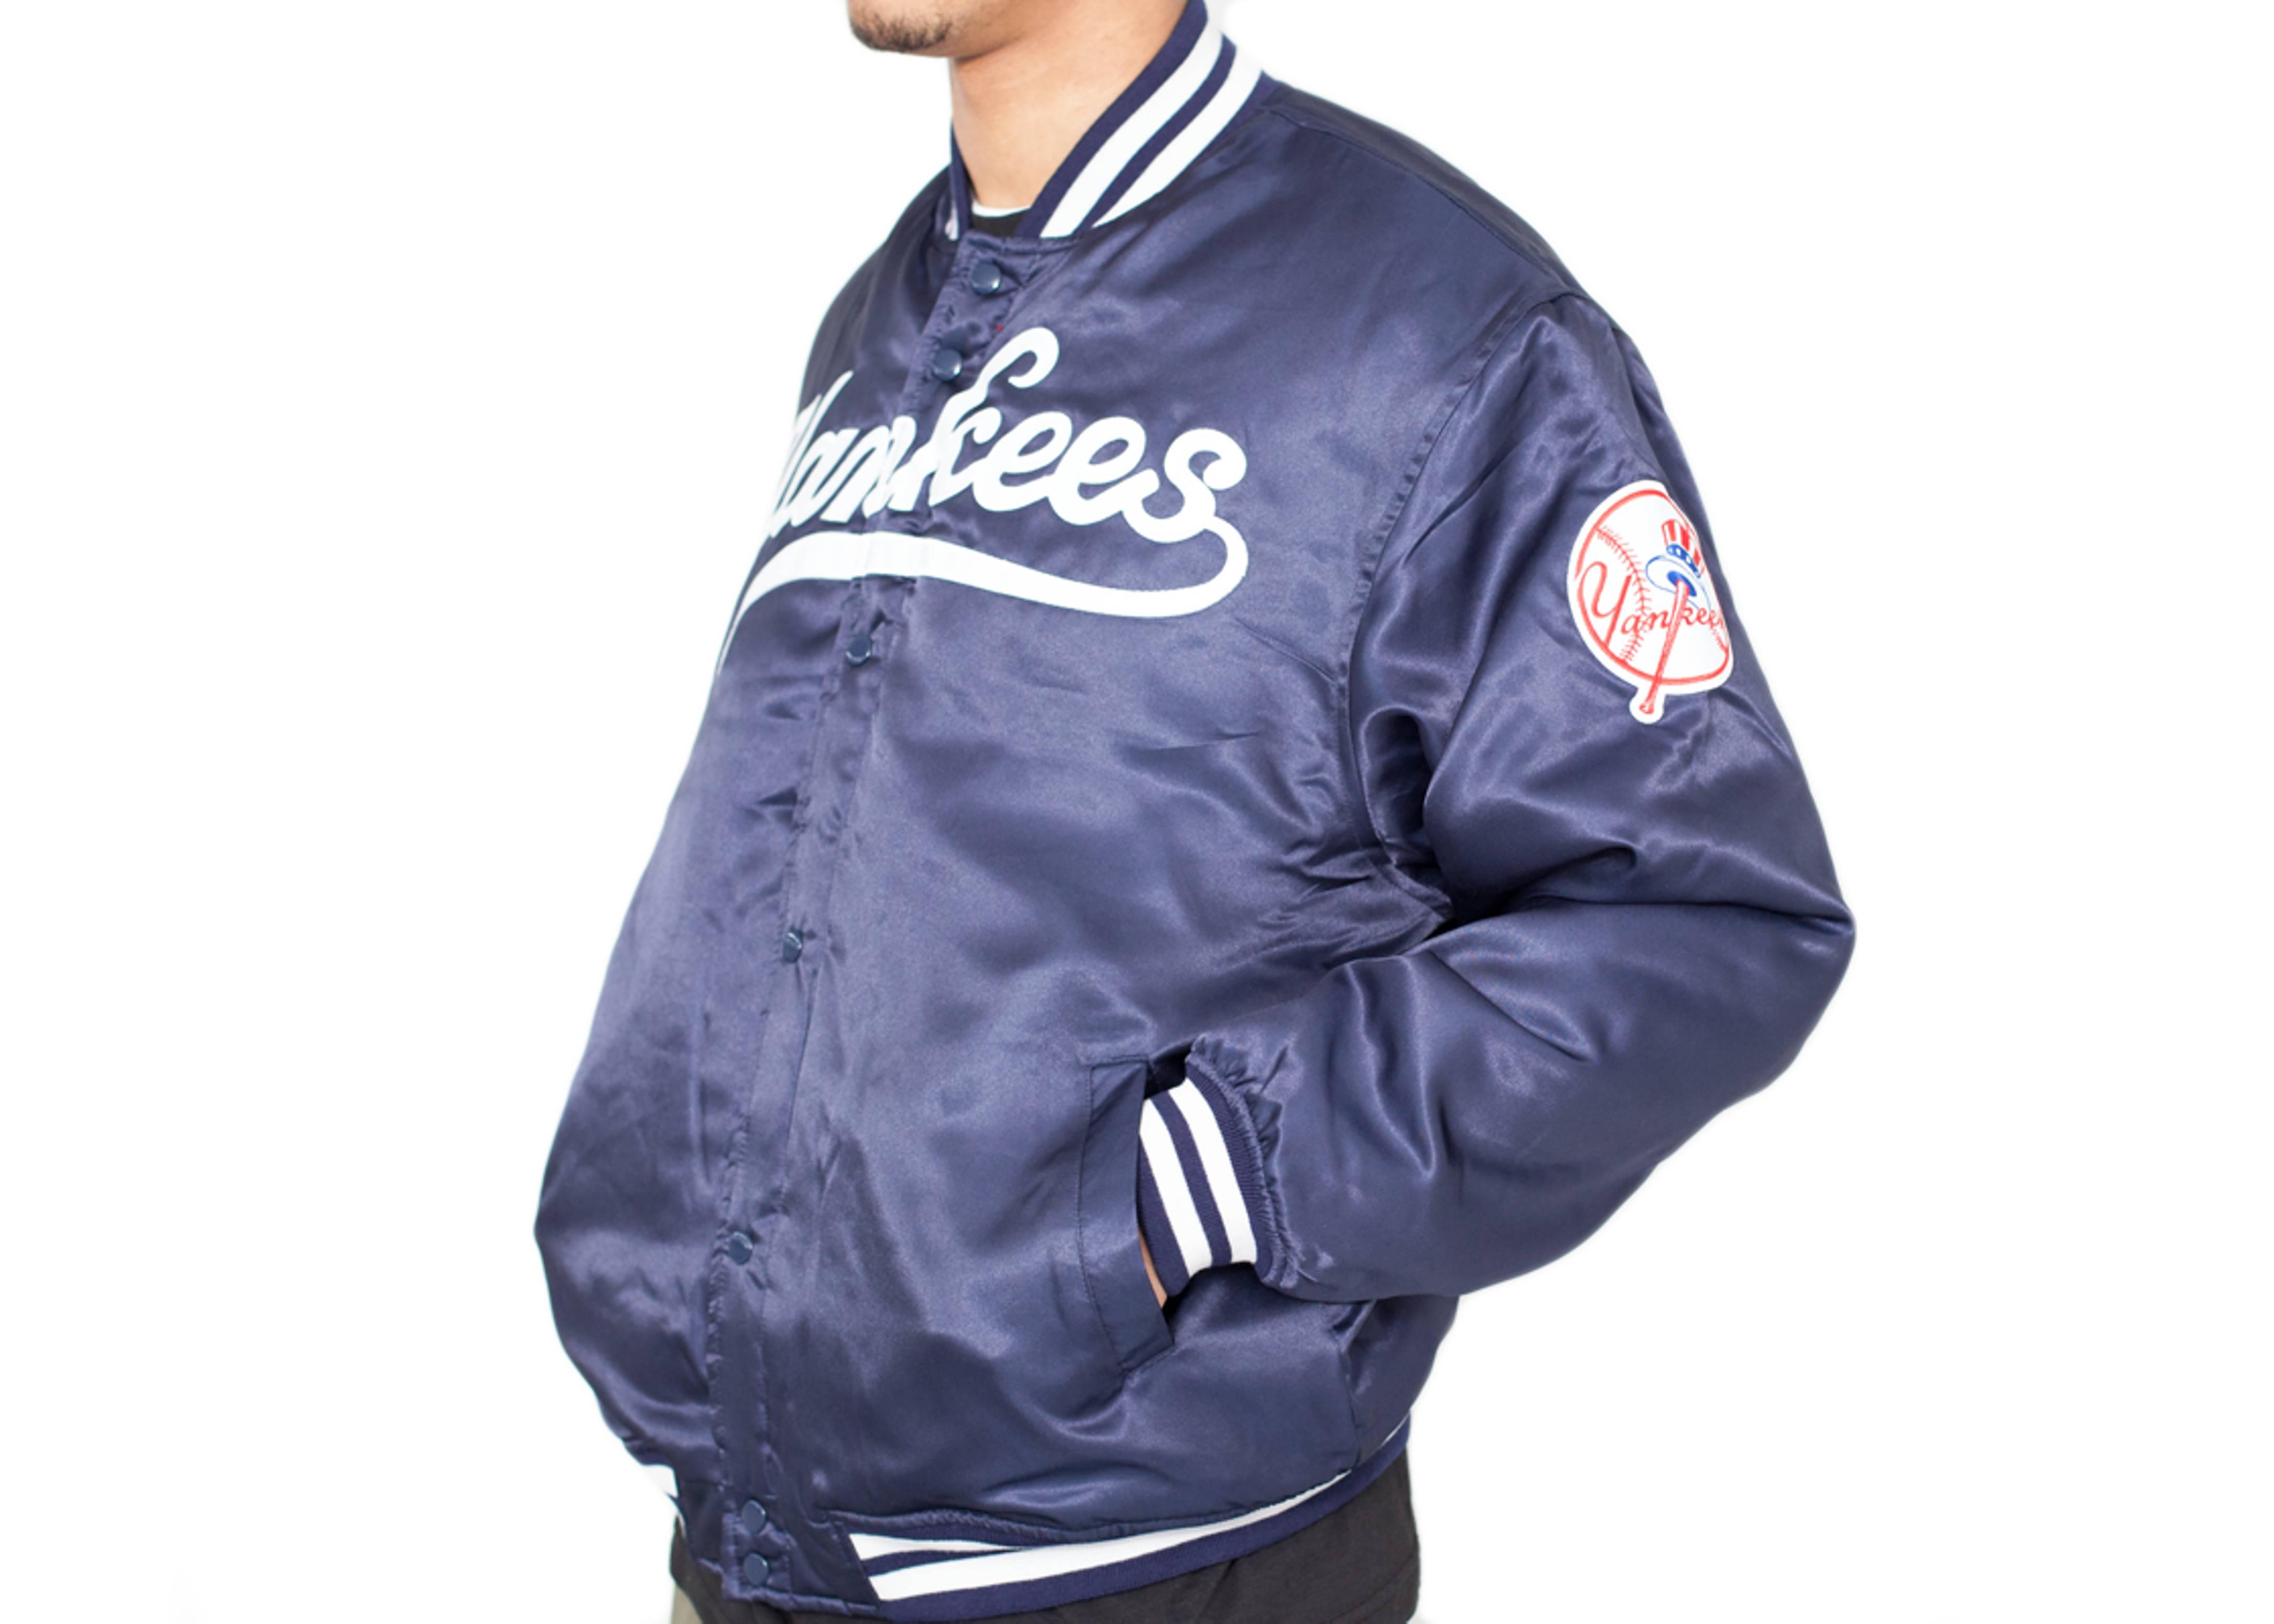 finest selection 79ac4 ef802 New York Yankees Mlb Satin Jacket - Mitchell & Ness - 43 ...